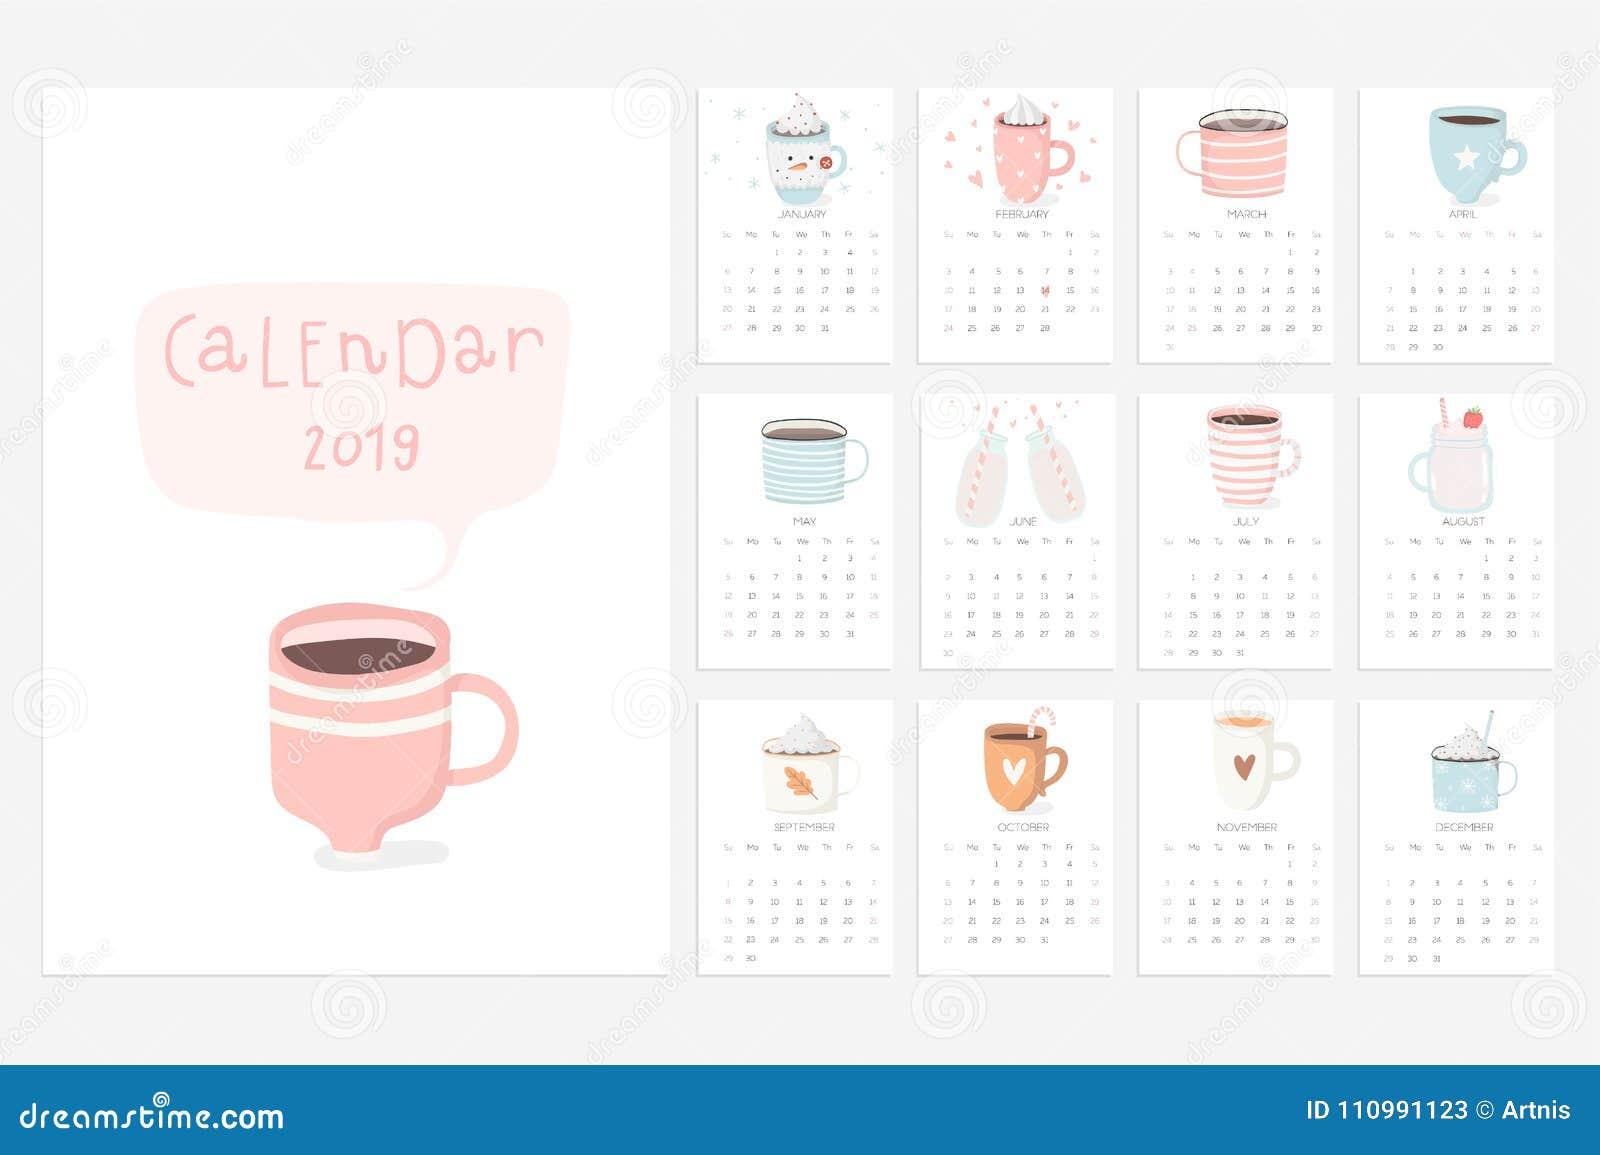 Fun 2019 Calendar Calendar 2019. Fun And Cute Calendar With Cute Hand Drawn Cups